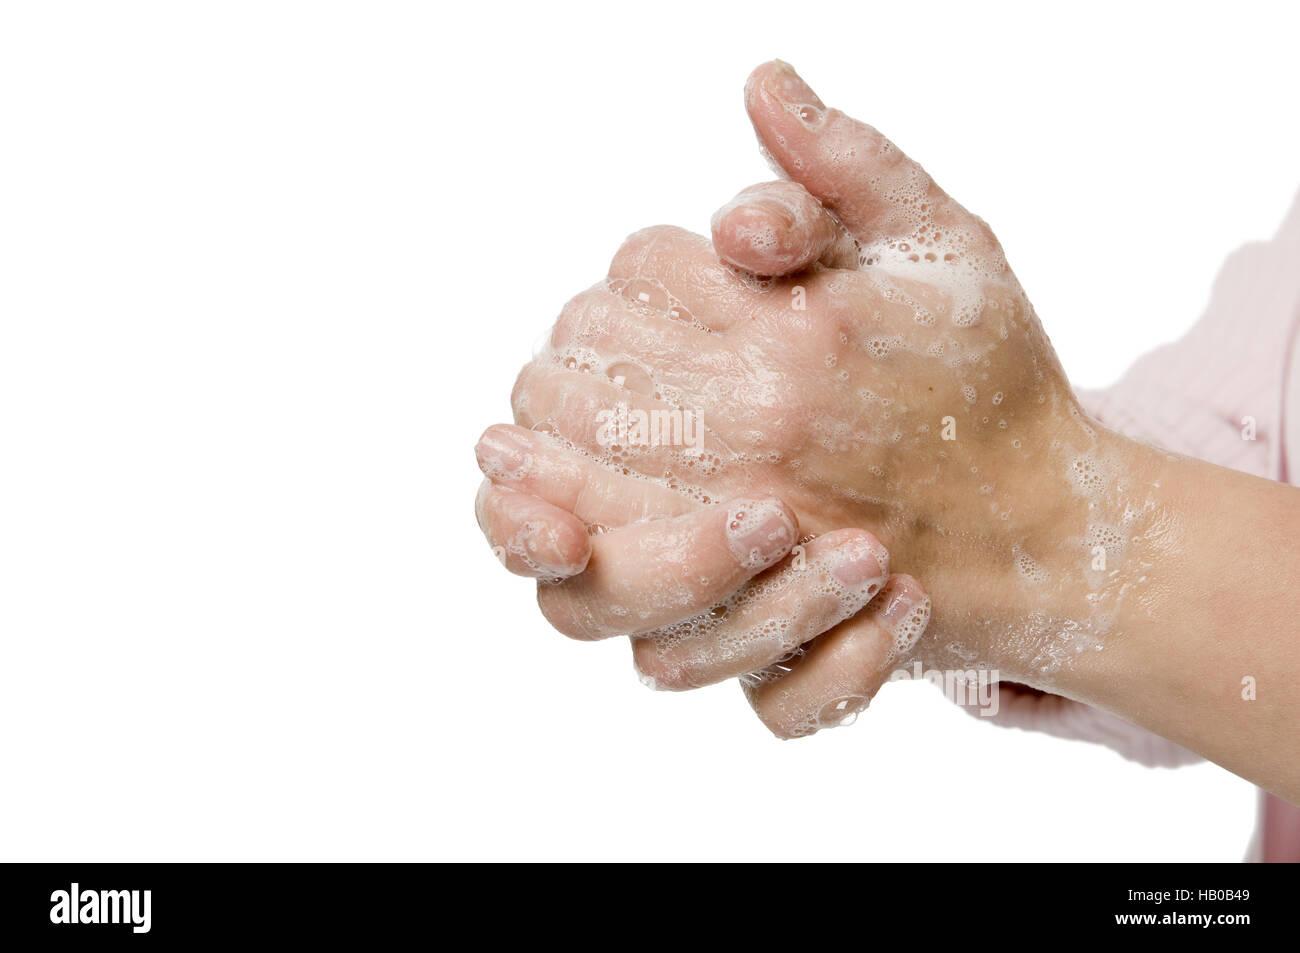 hand washing - Stock Image